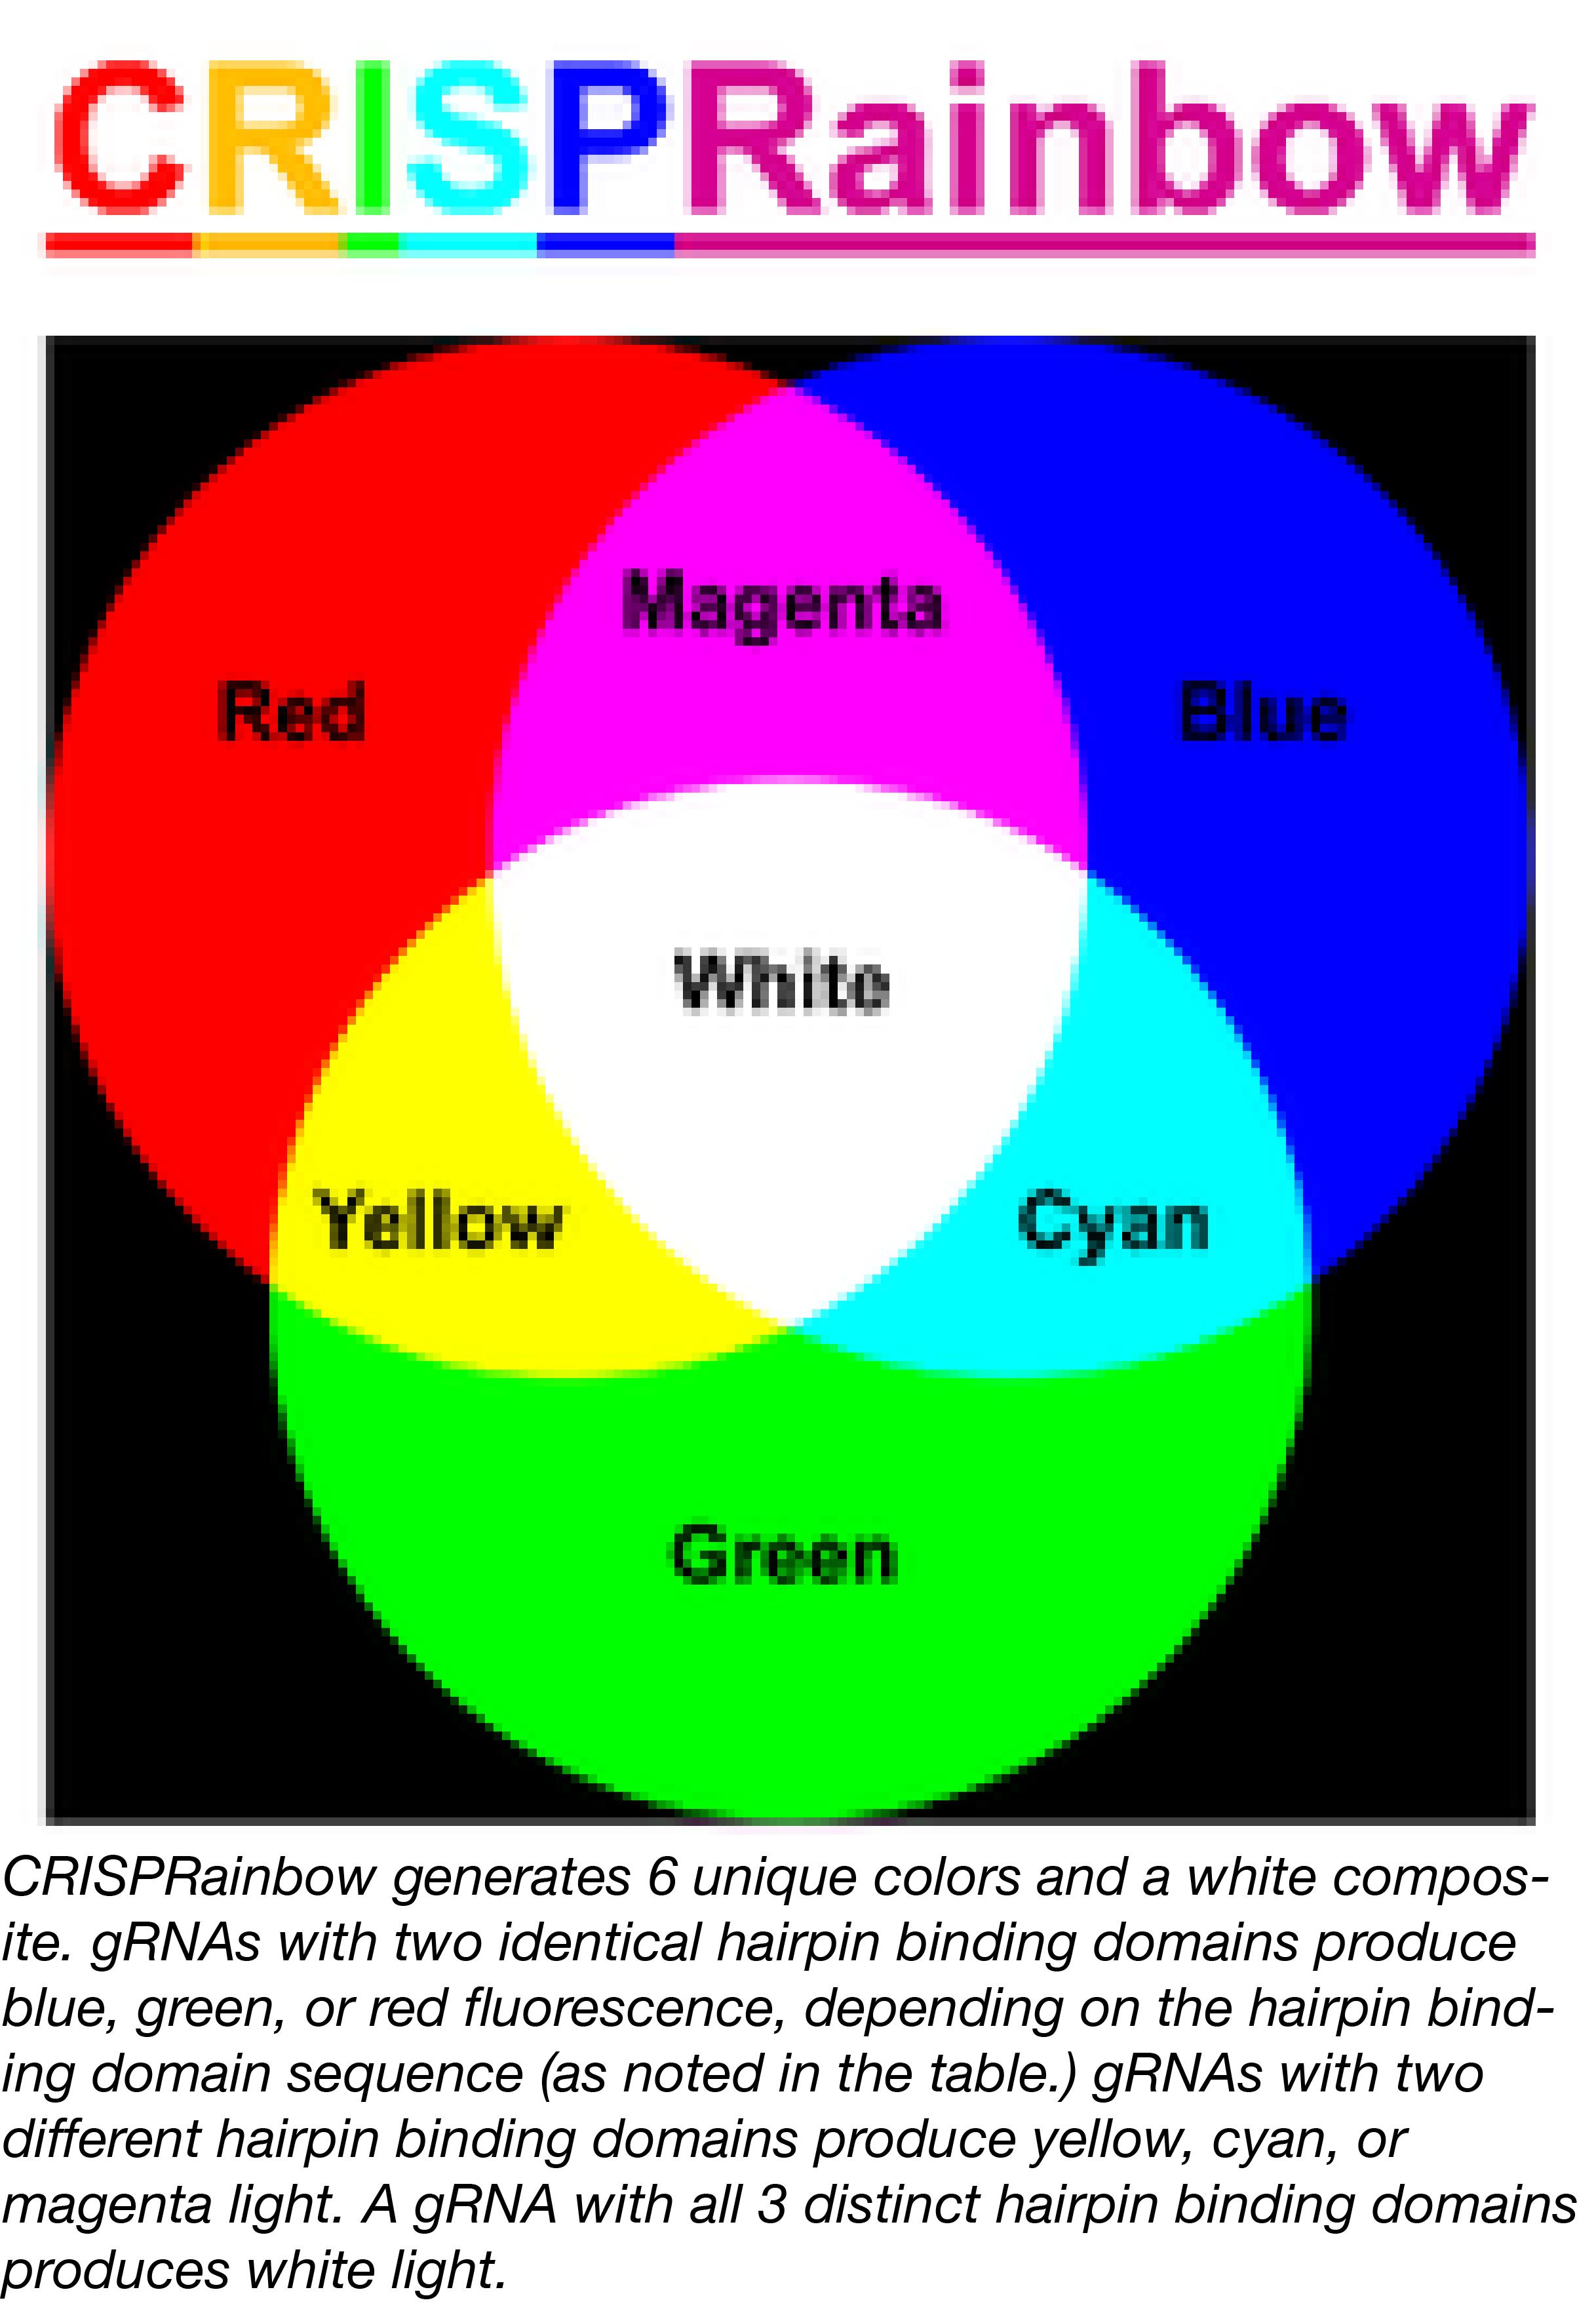 CRISPRainbow Colors